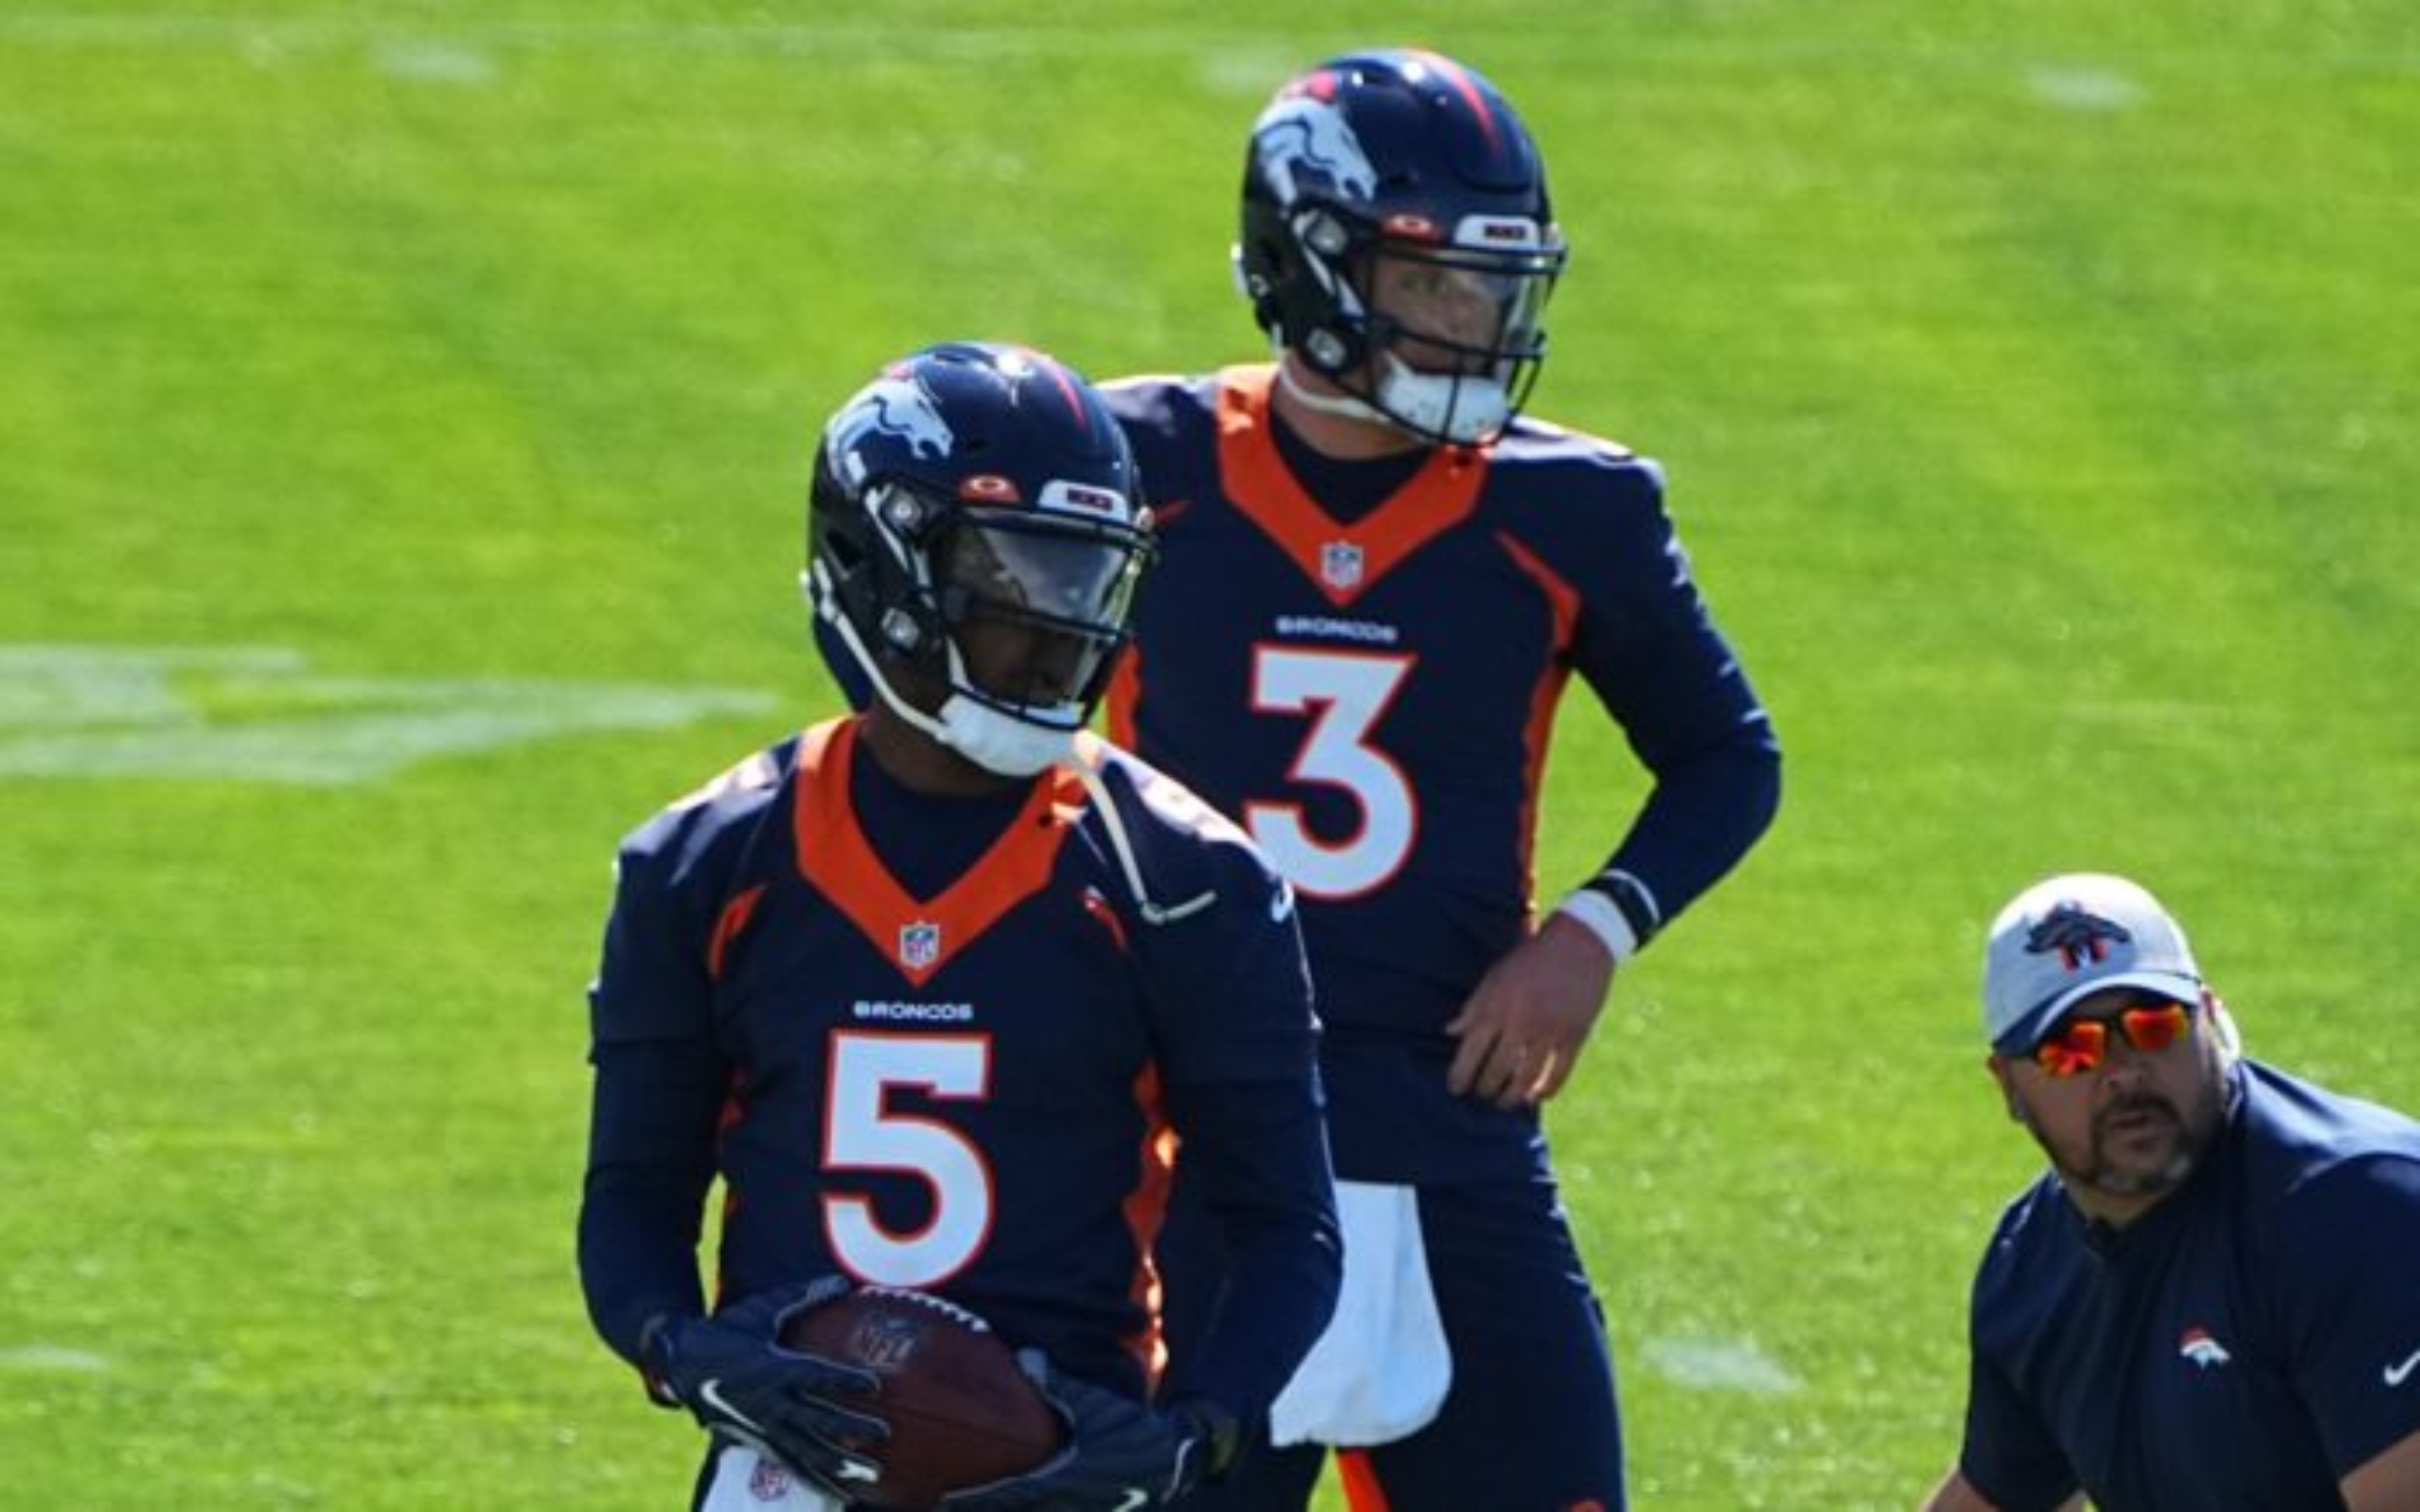 Drew Lock and Teddy Bridgewater at Broncos OTAs. Credit: Ron Chenoy, USA TODAY Sports.